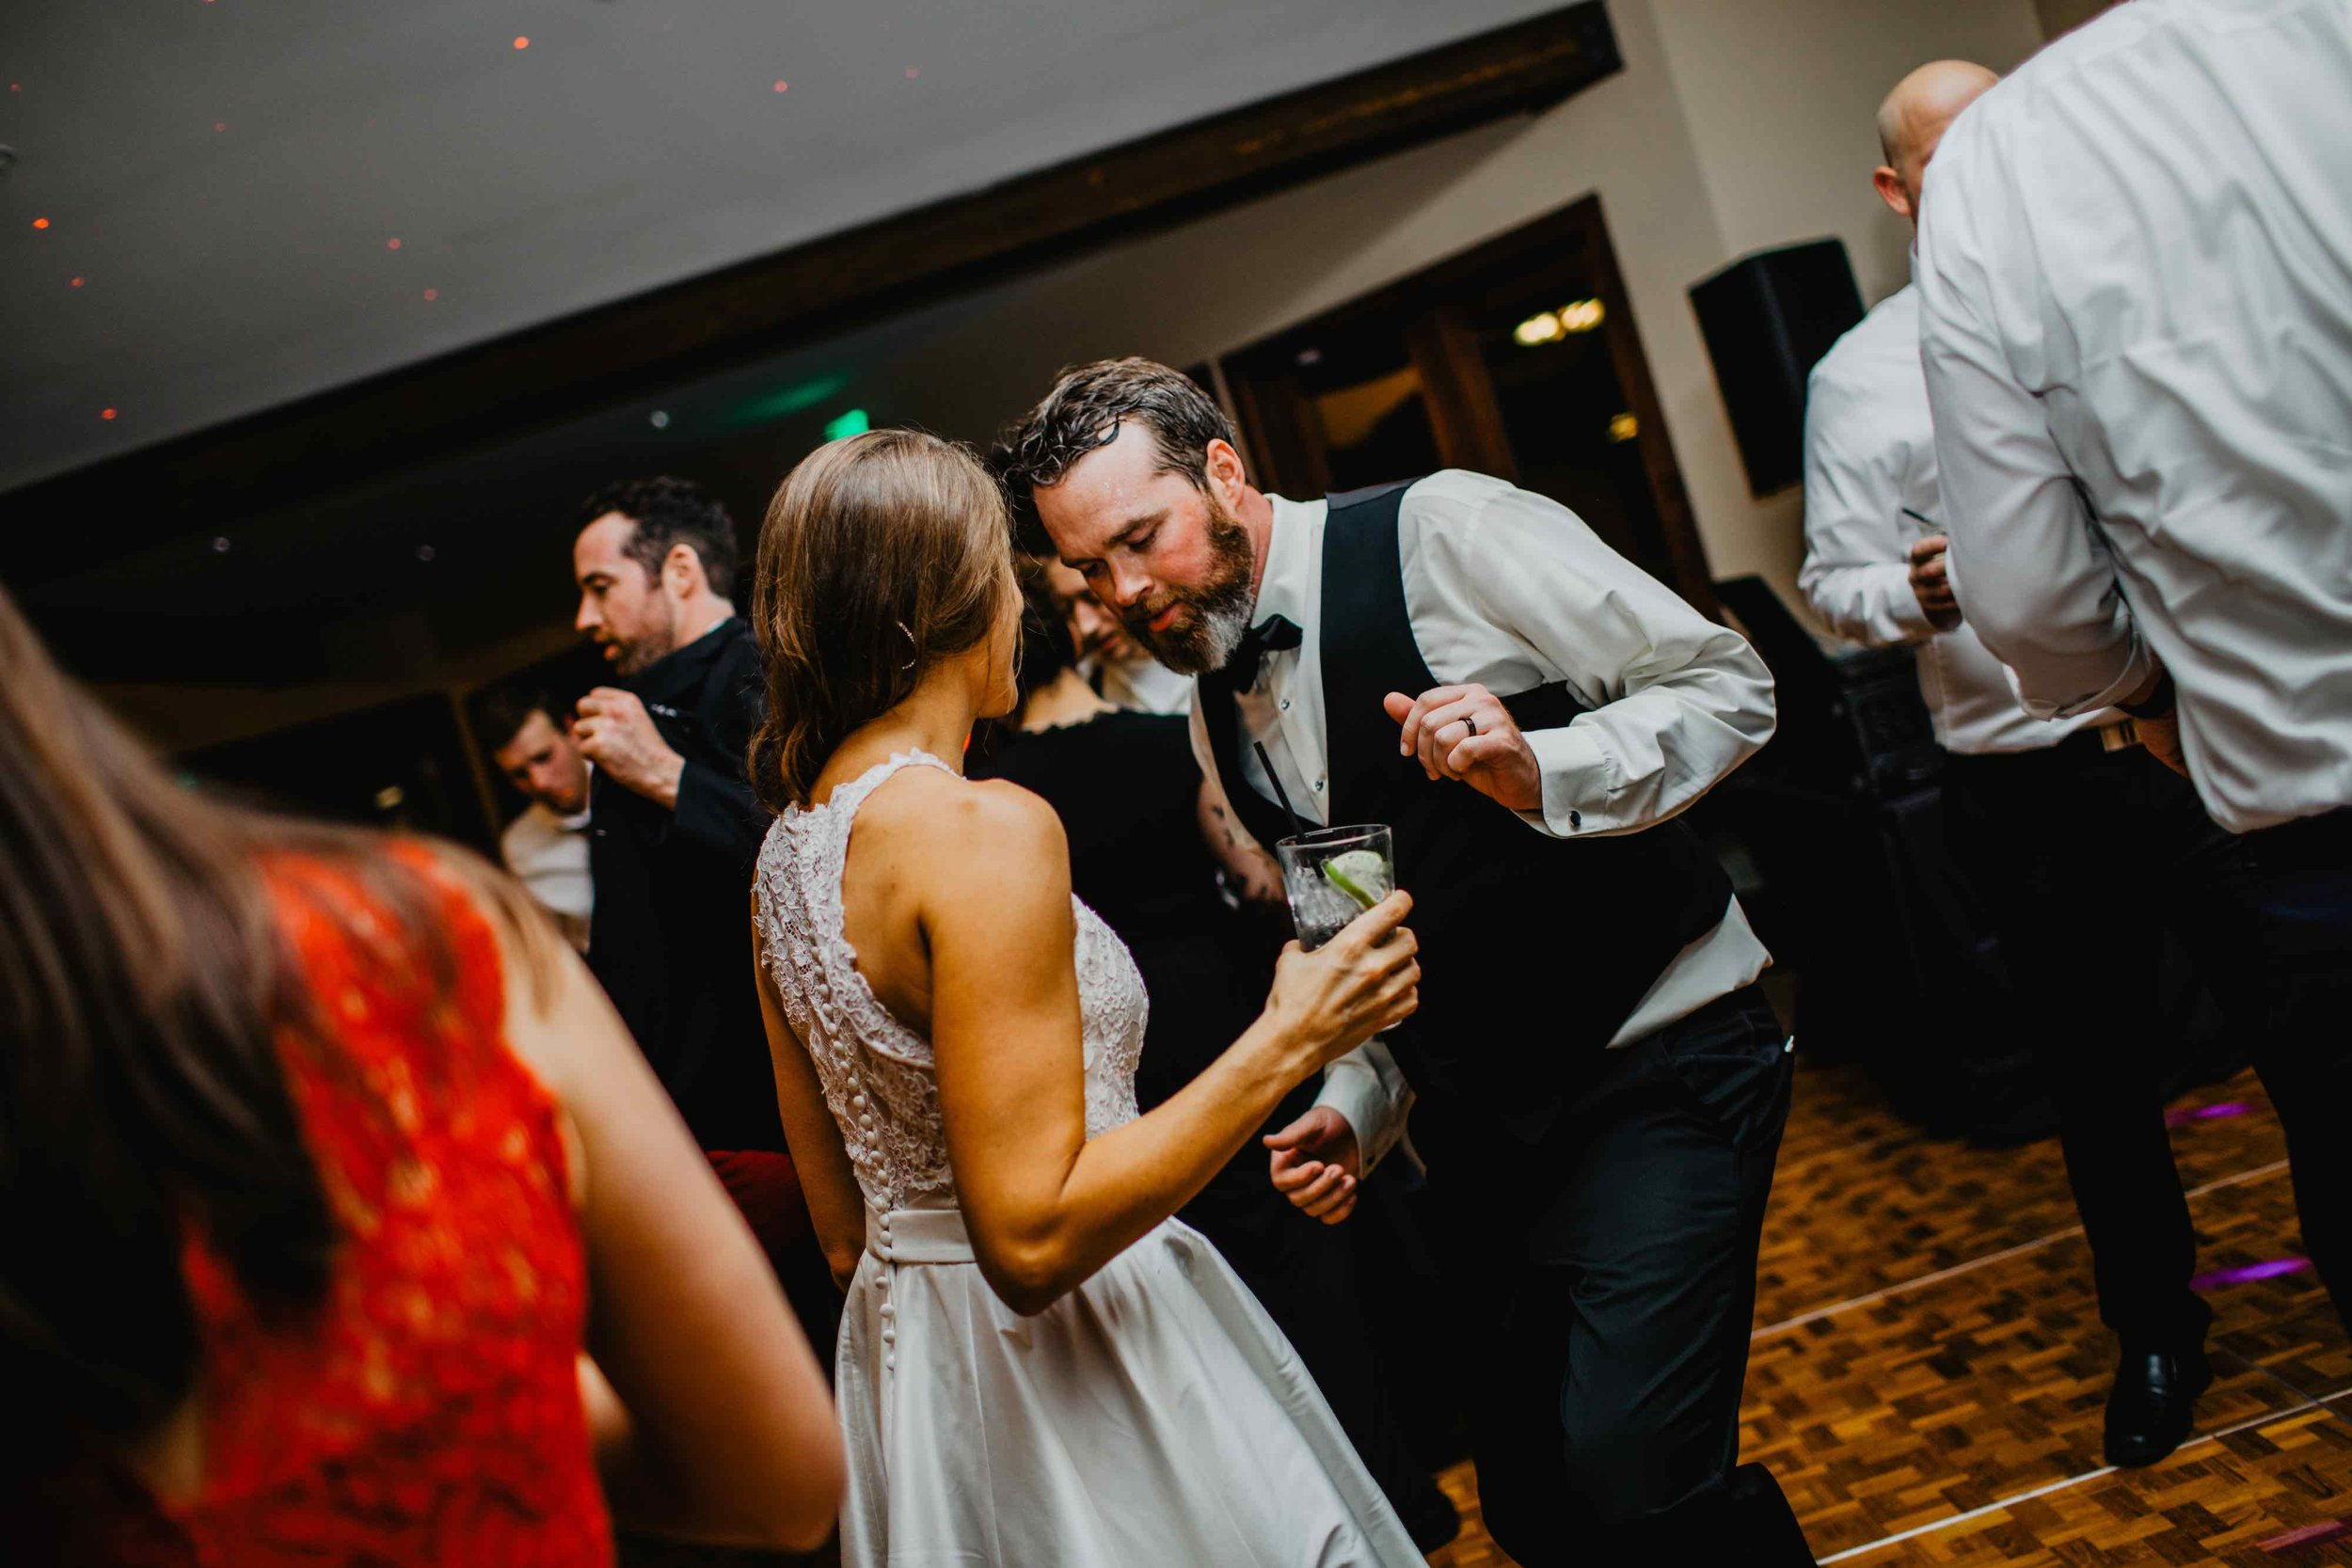 Kisa Conrad Favorites-0056-colorado-wedding-photographer-denver-springs-vailhotel-glenwood-springs-colorado-wedding-photographer.jpeg